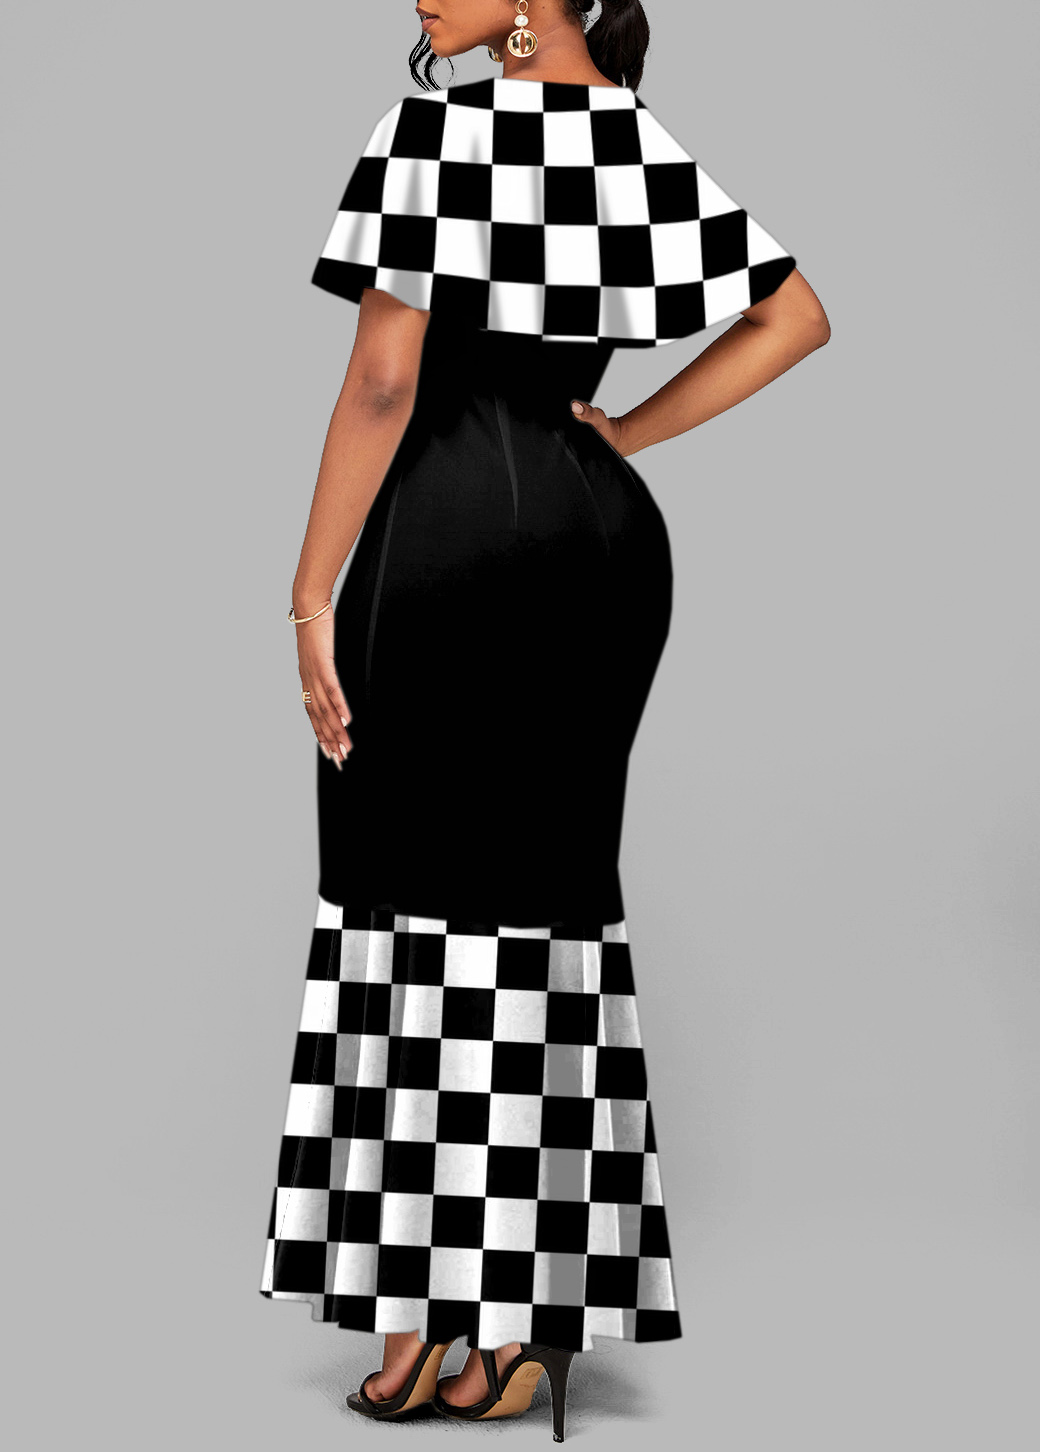 Short Sleeve Round Neck Checkerboard Pattern Mermaid Dress